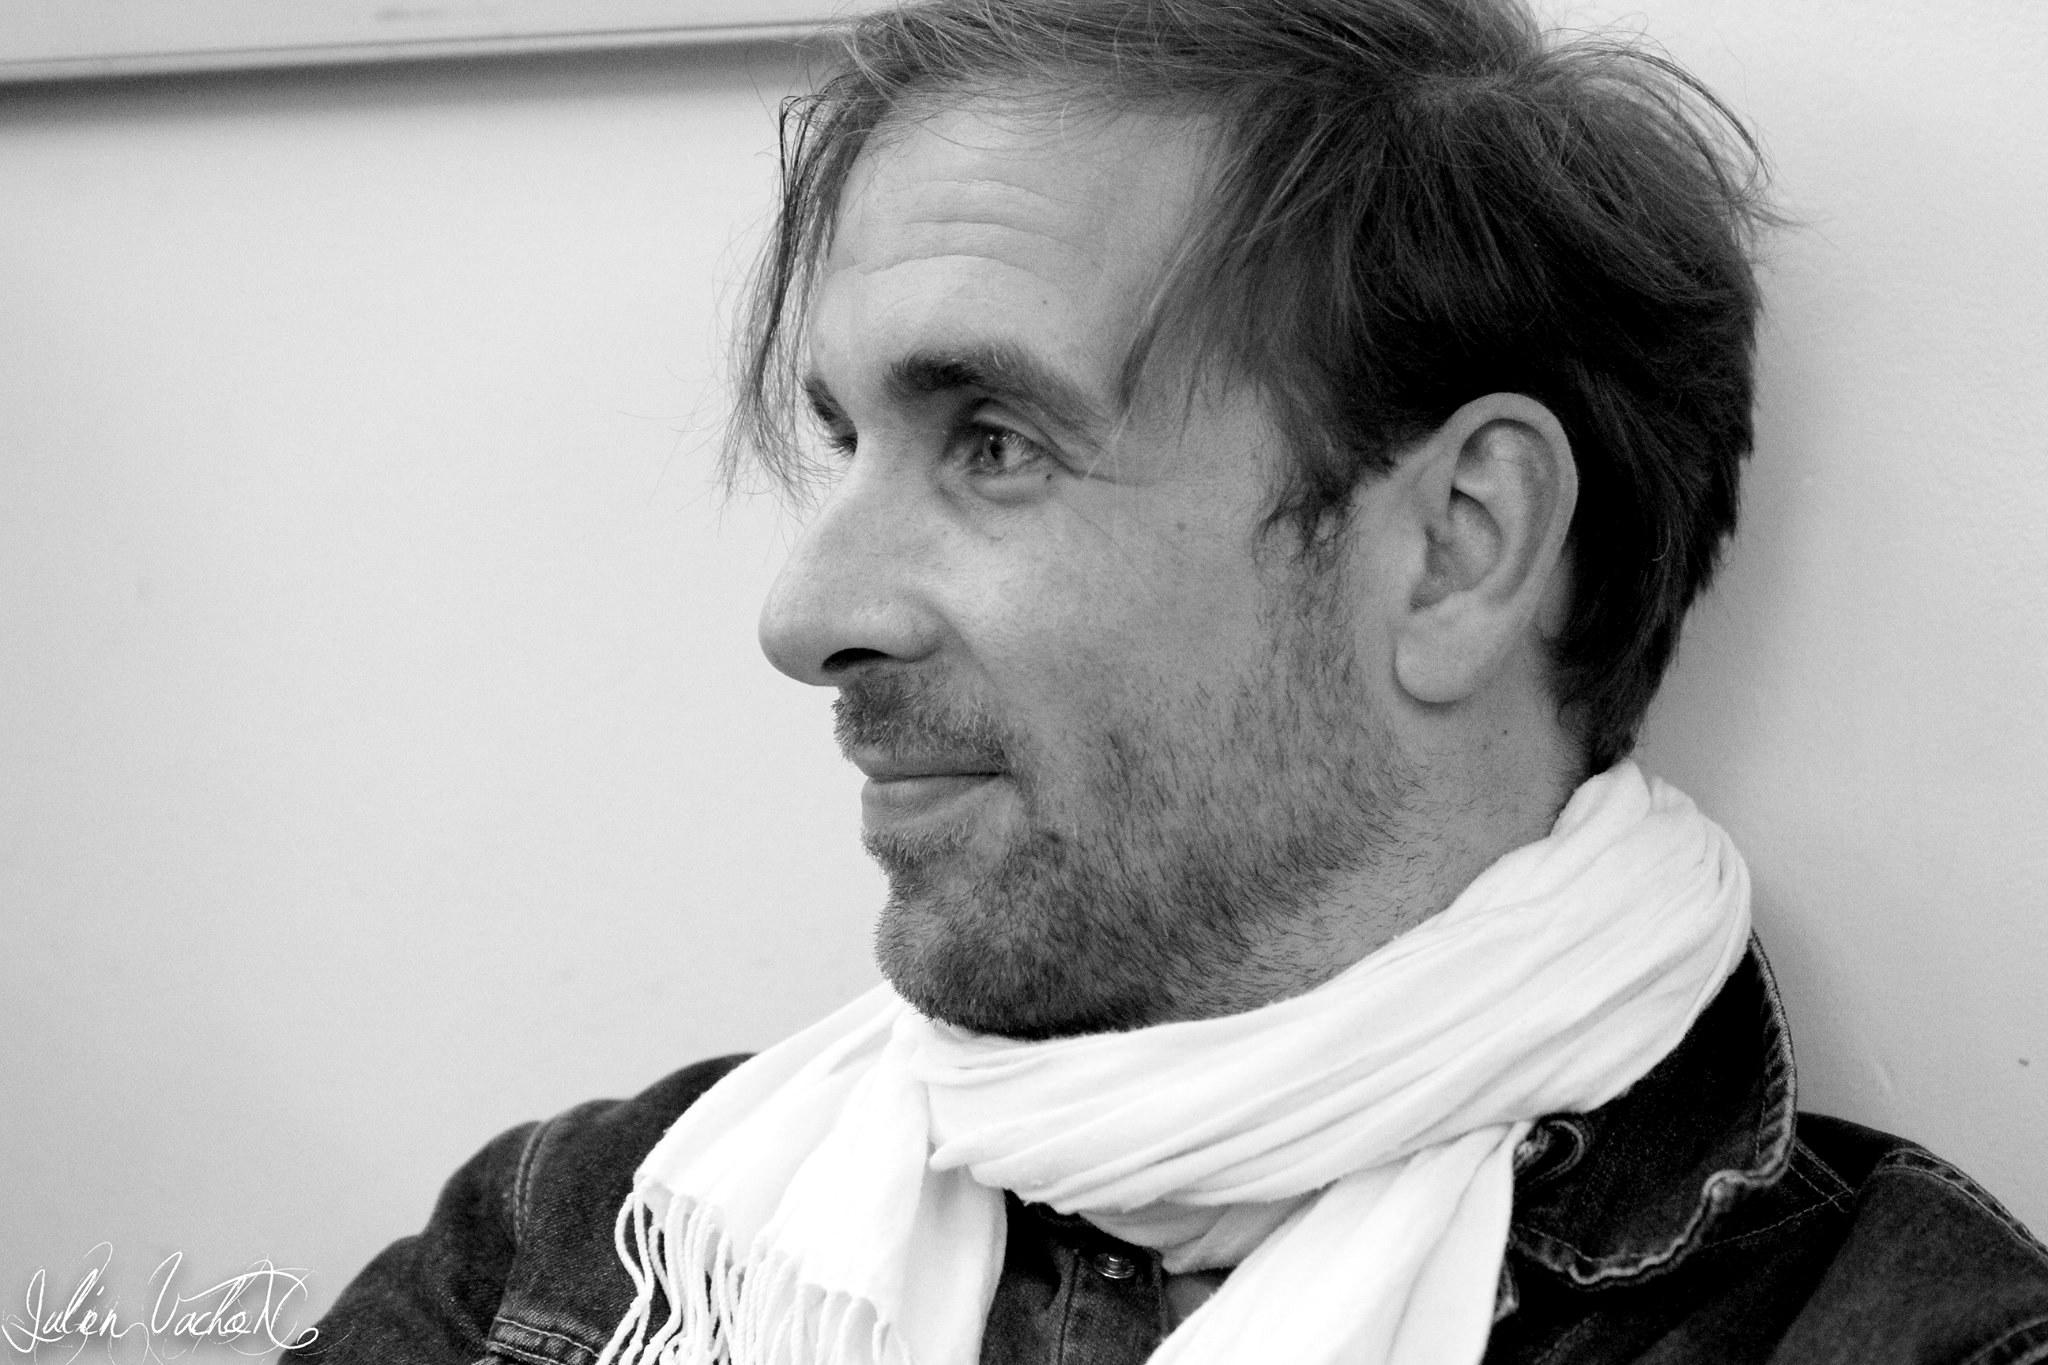 David Gategno